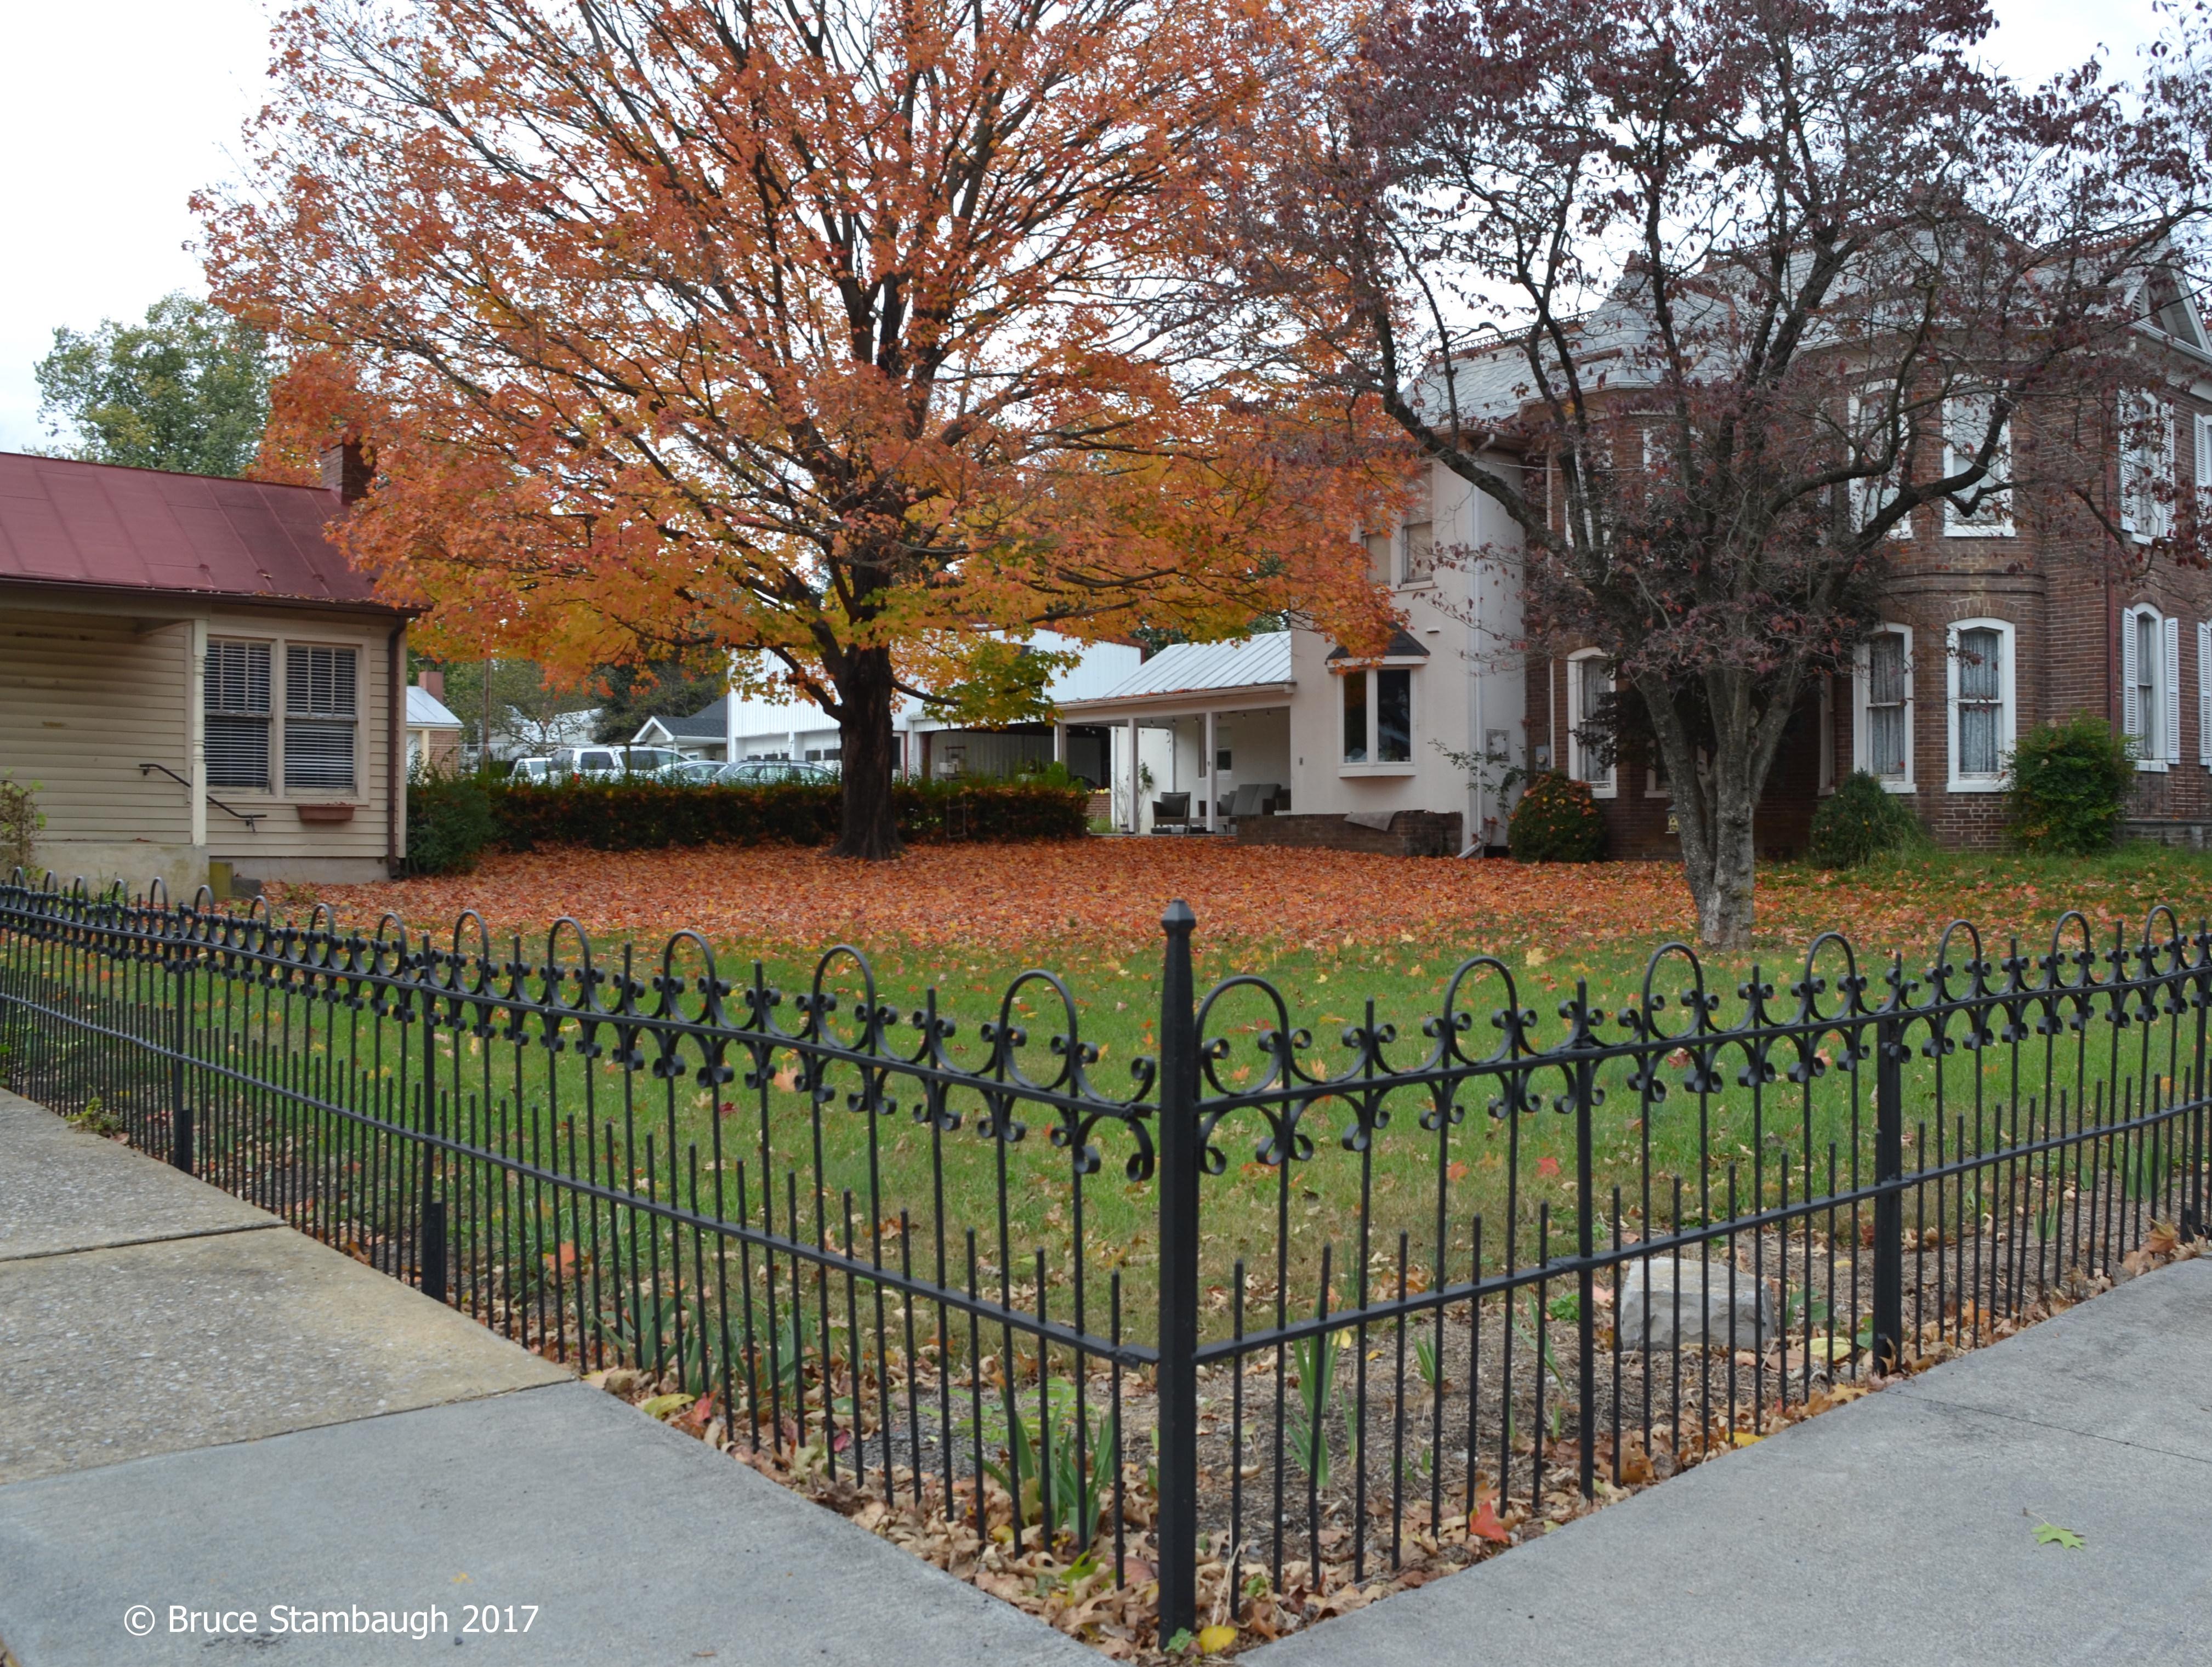 autumn leaves, sugar maple leaves, iron fence